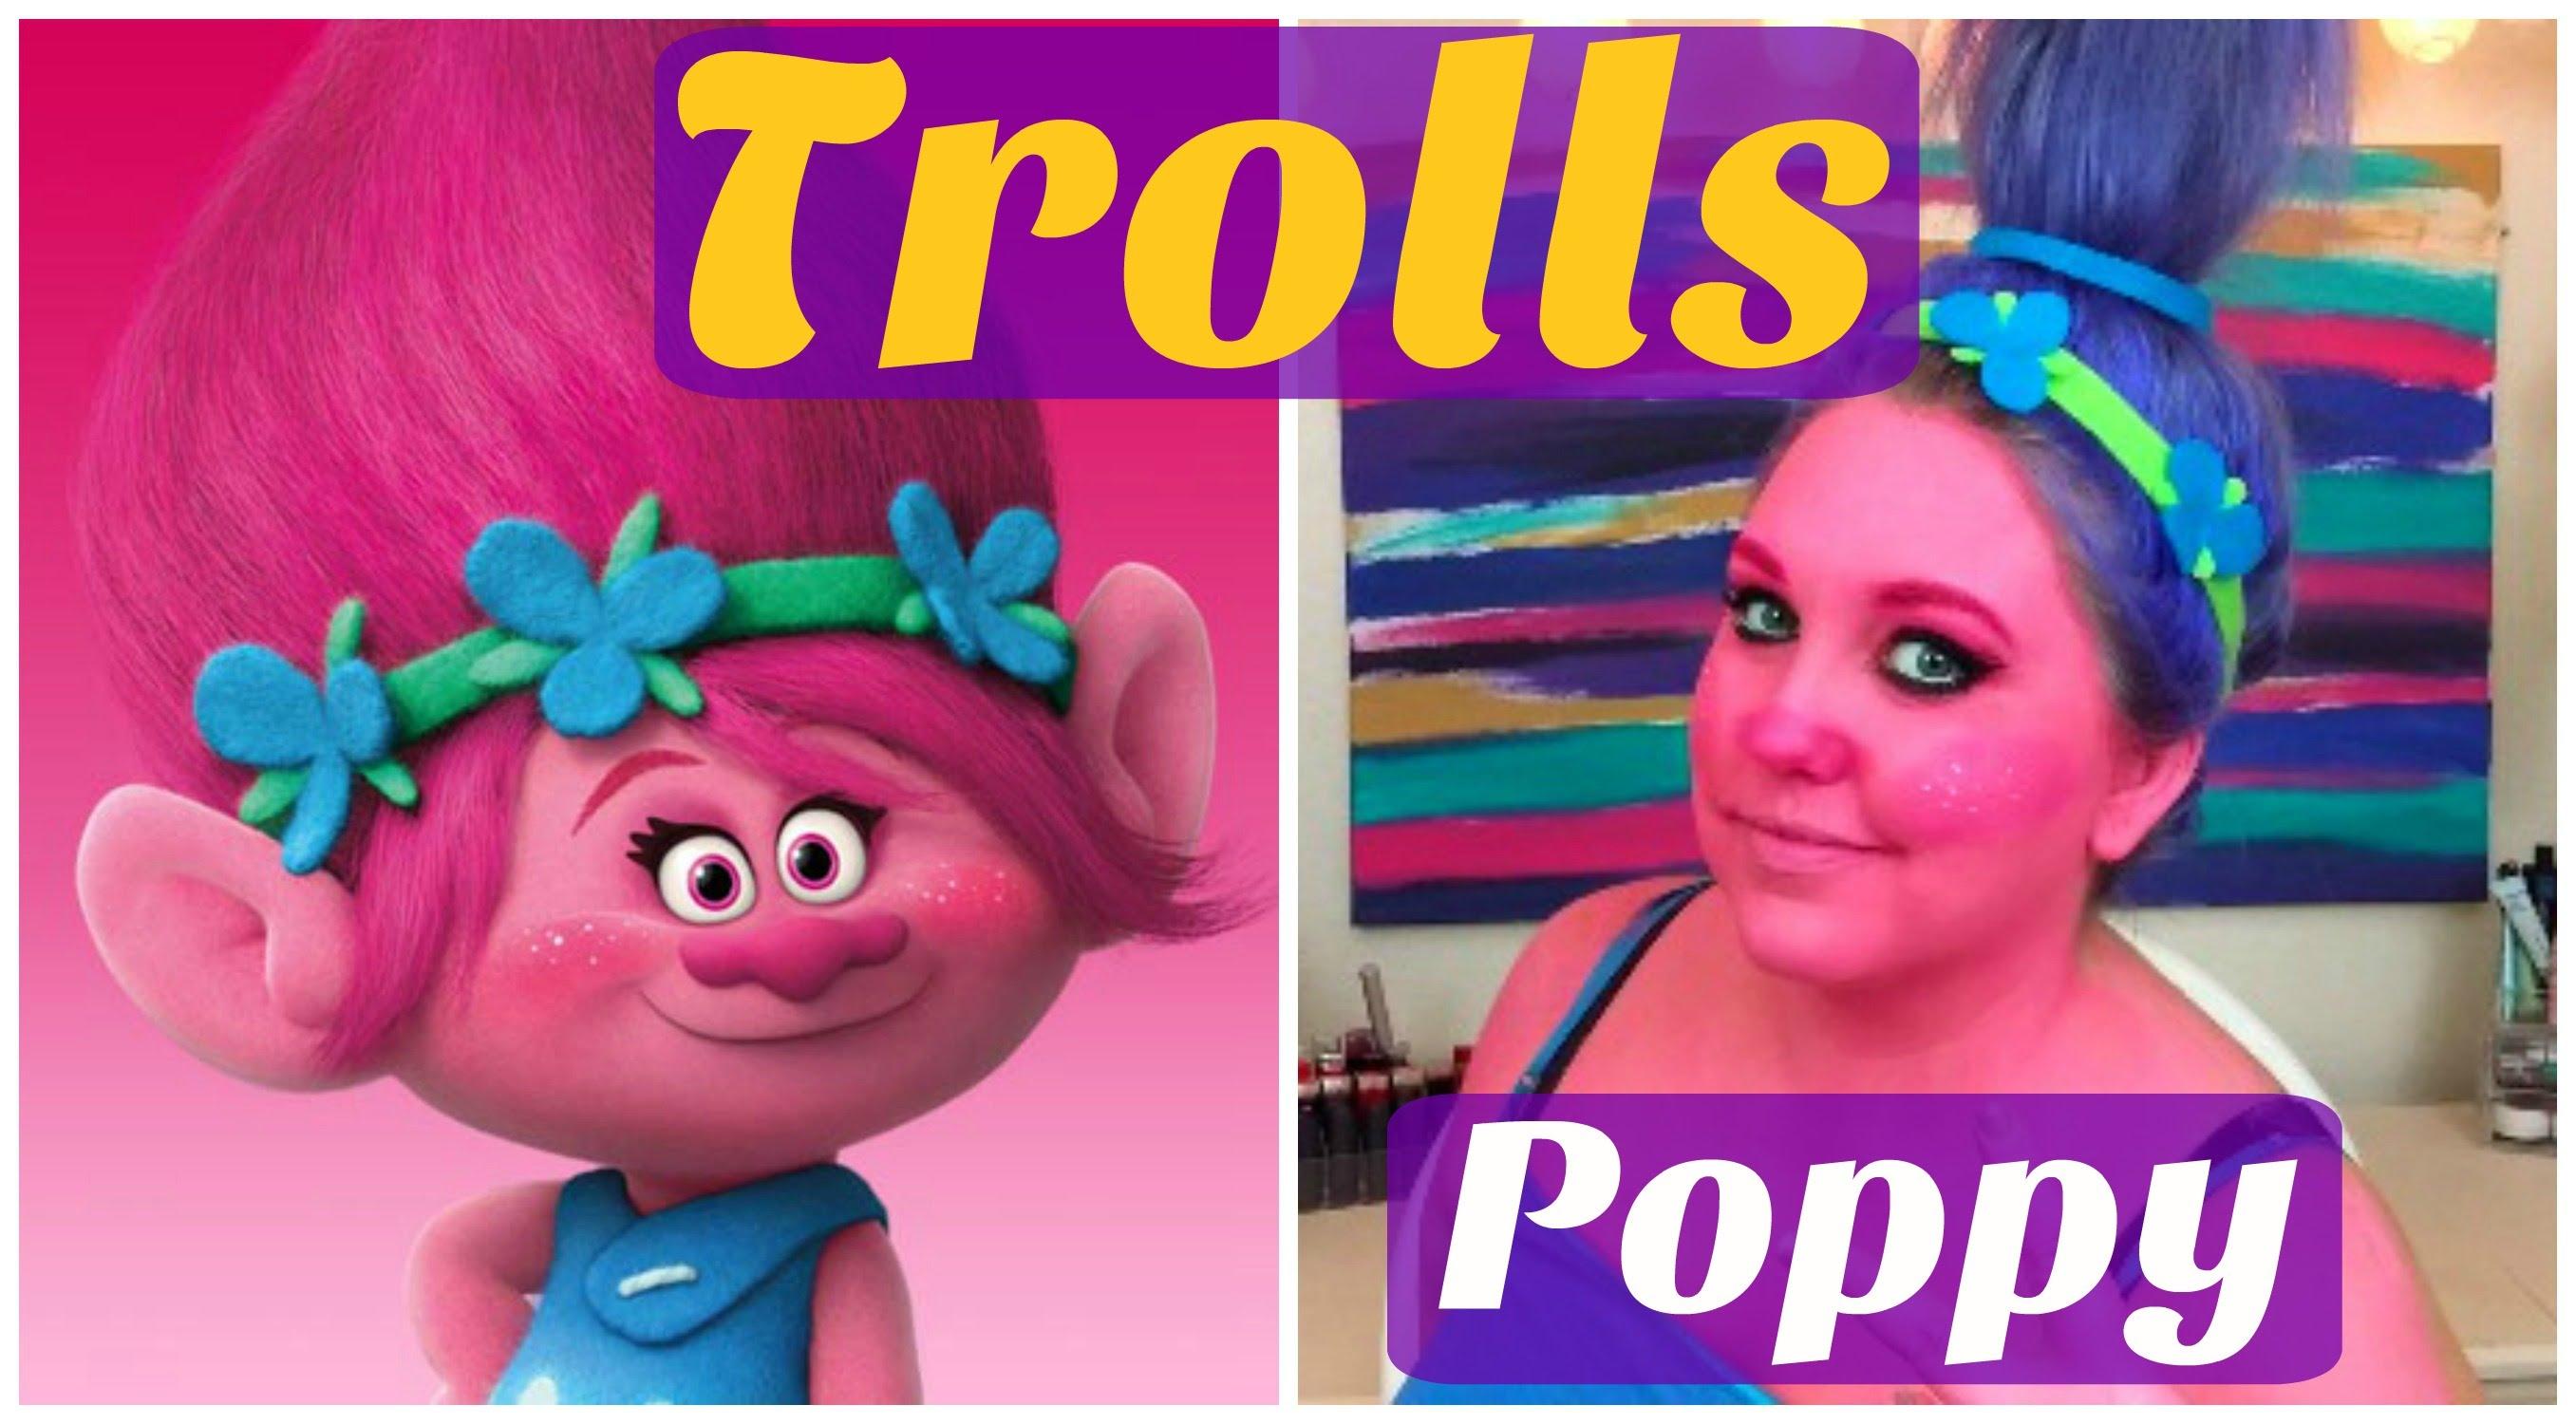 Trolls movie Widescreen for desktop